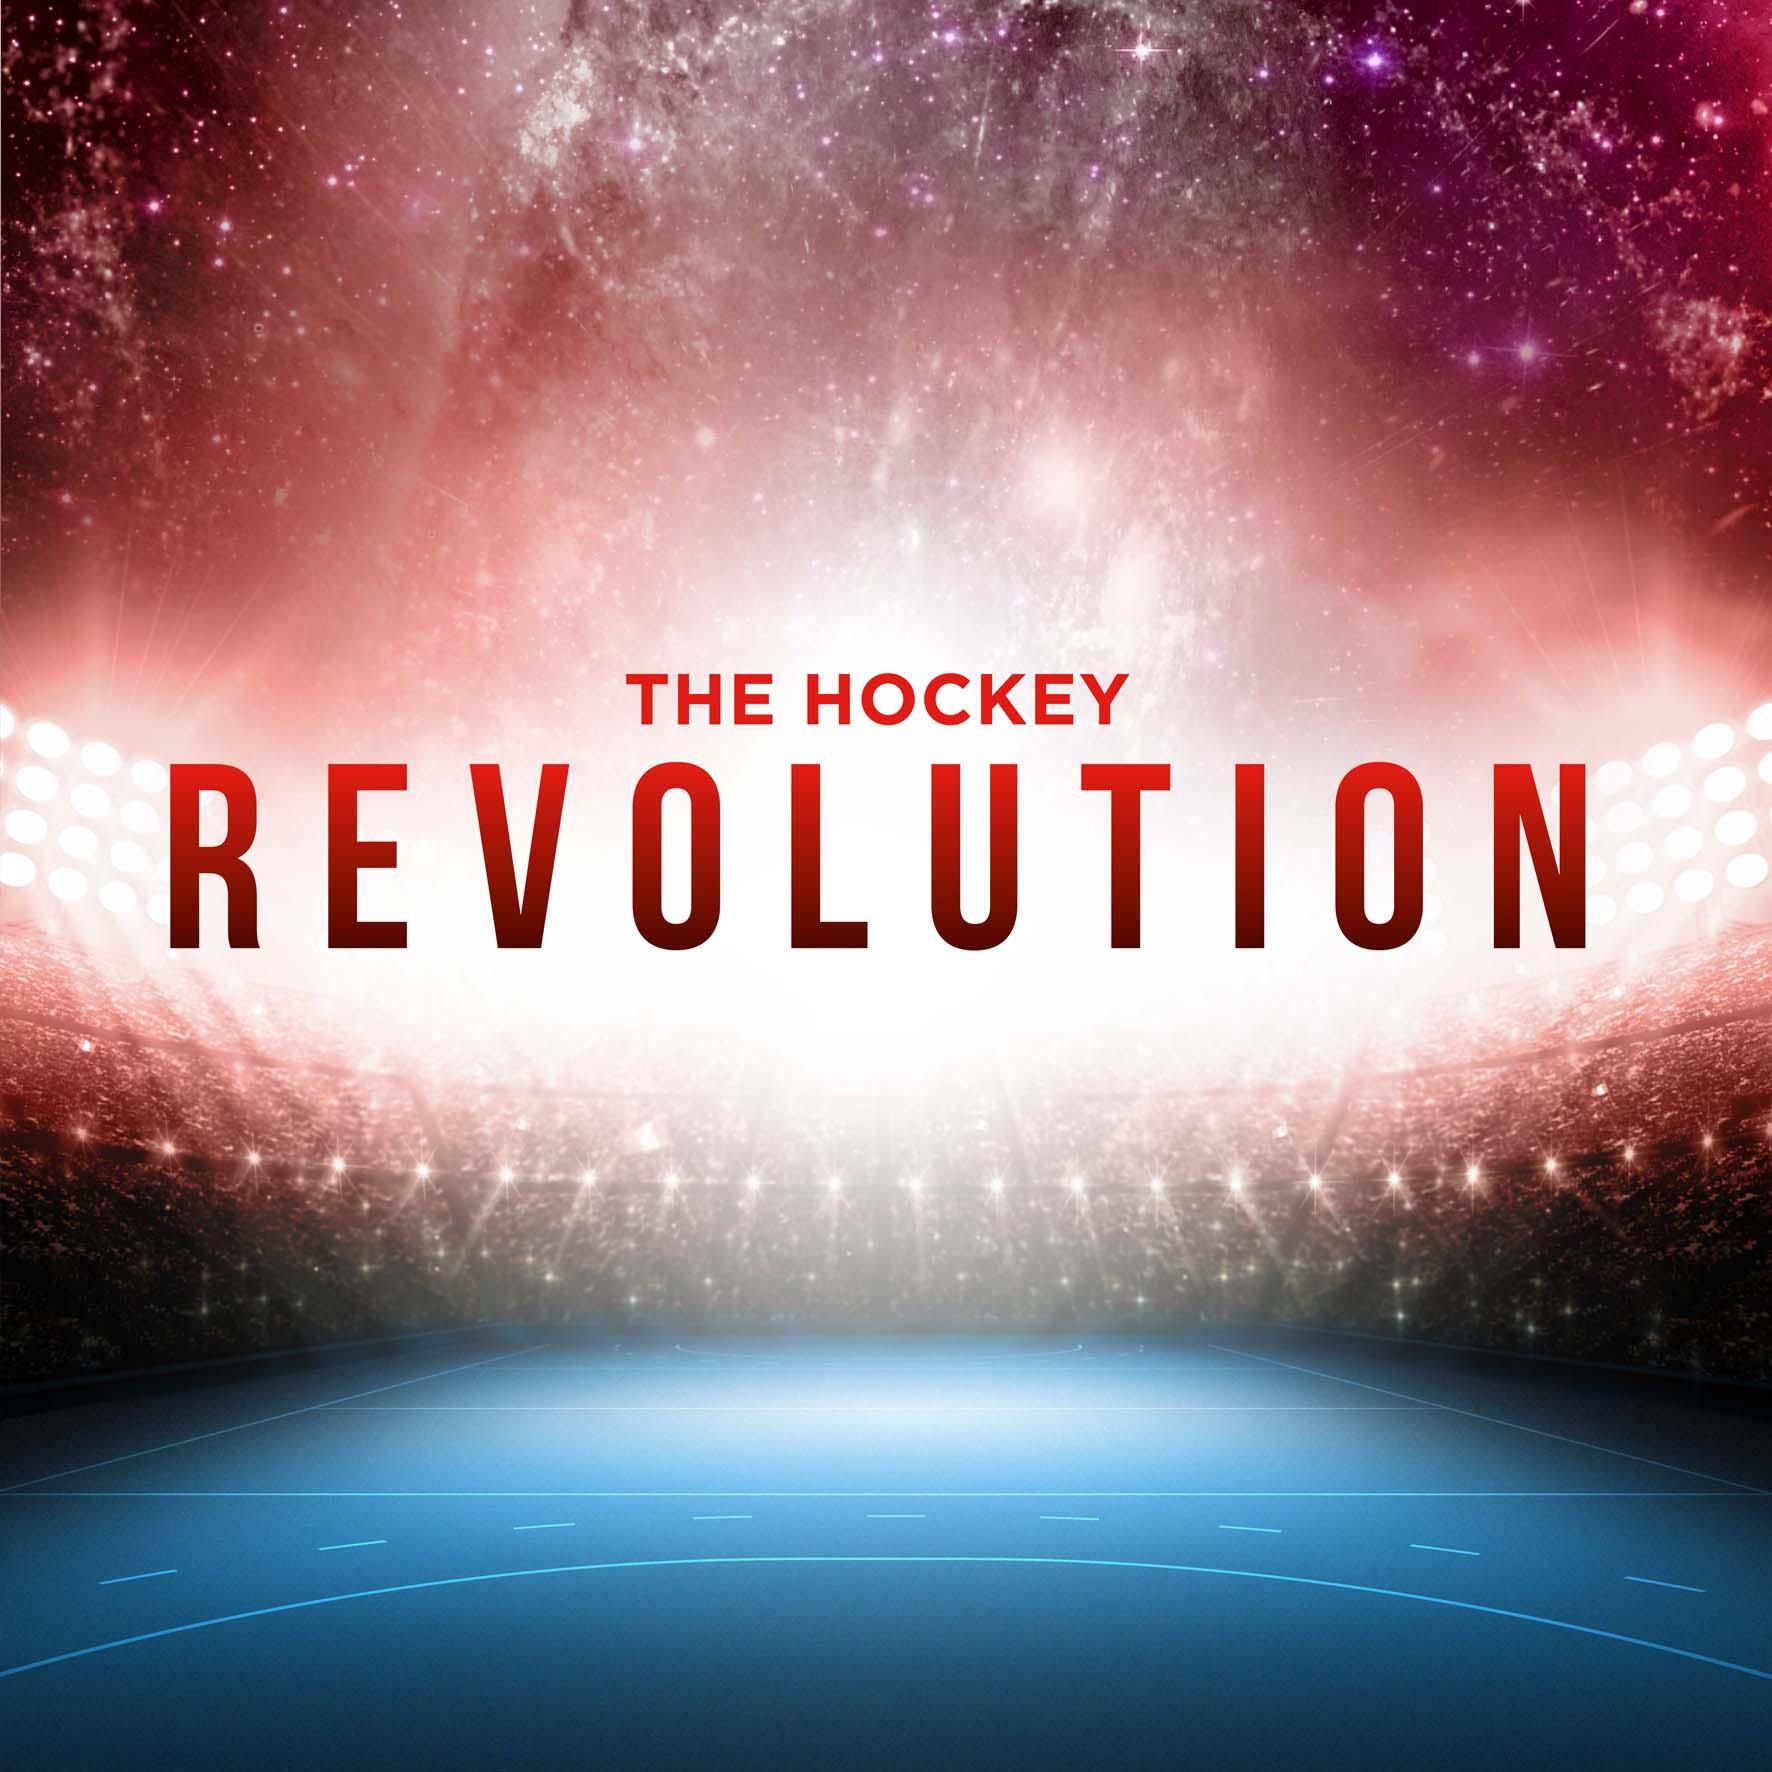 FIH  HOCKEY REVOLUTION  A REVOLUTIONARY STRATEGY FOR THE SPORT